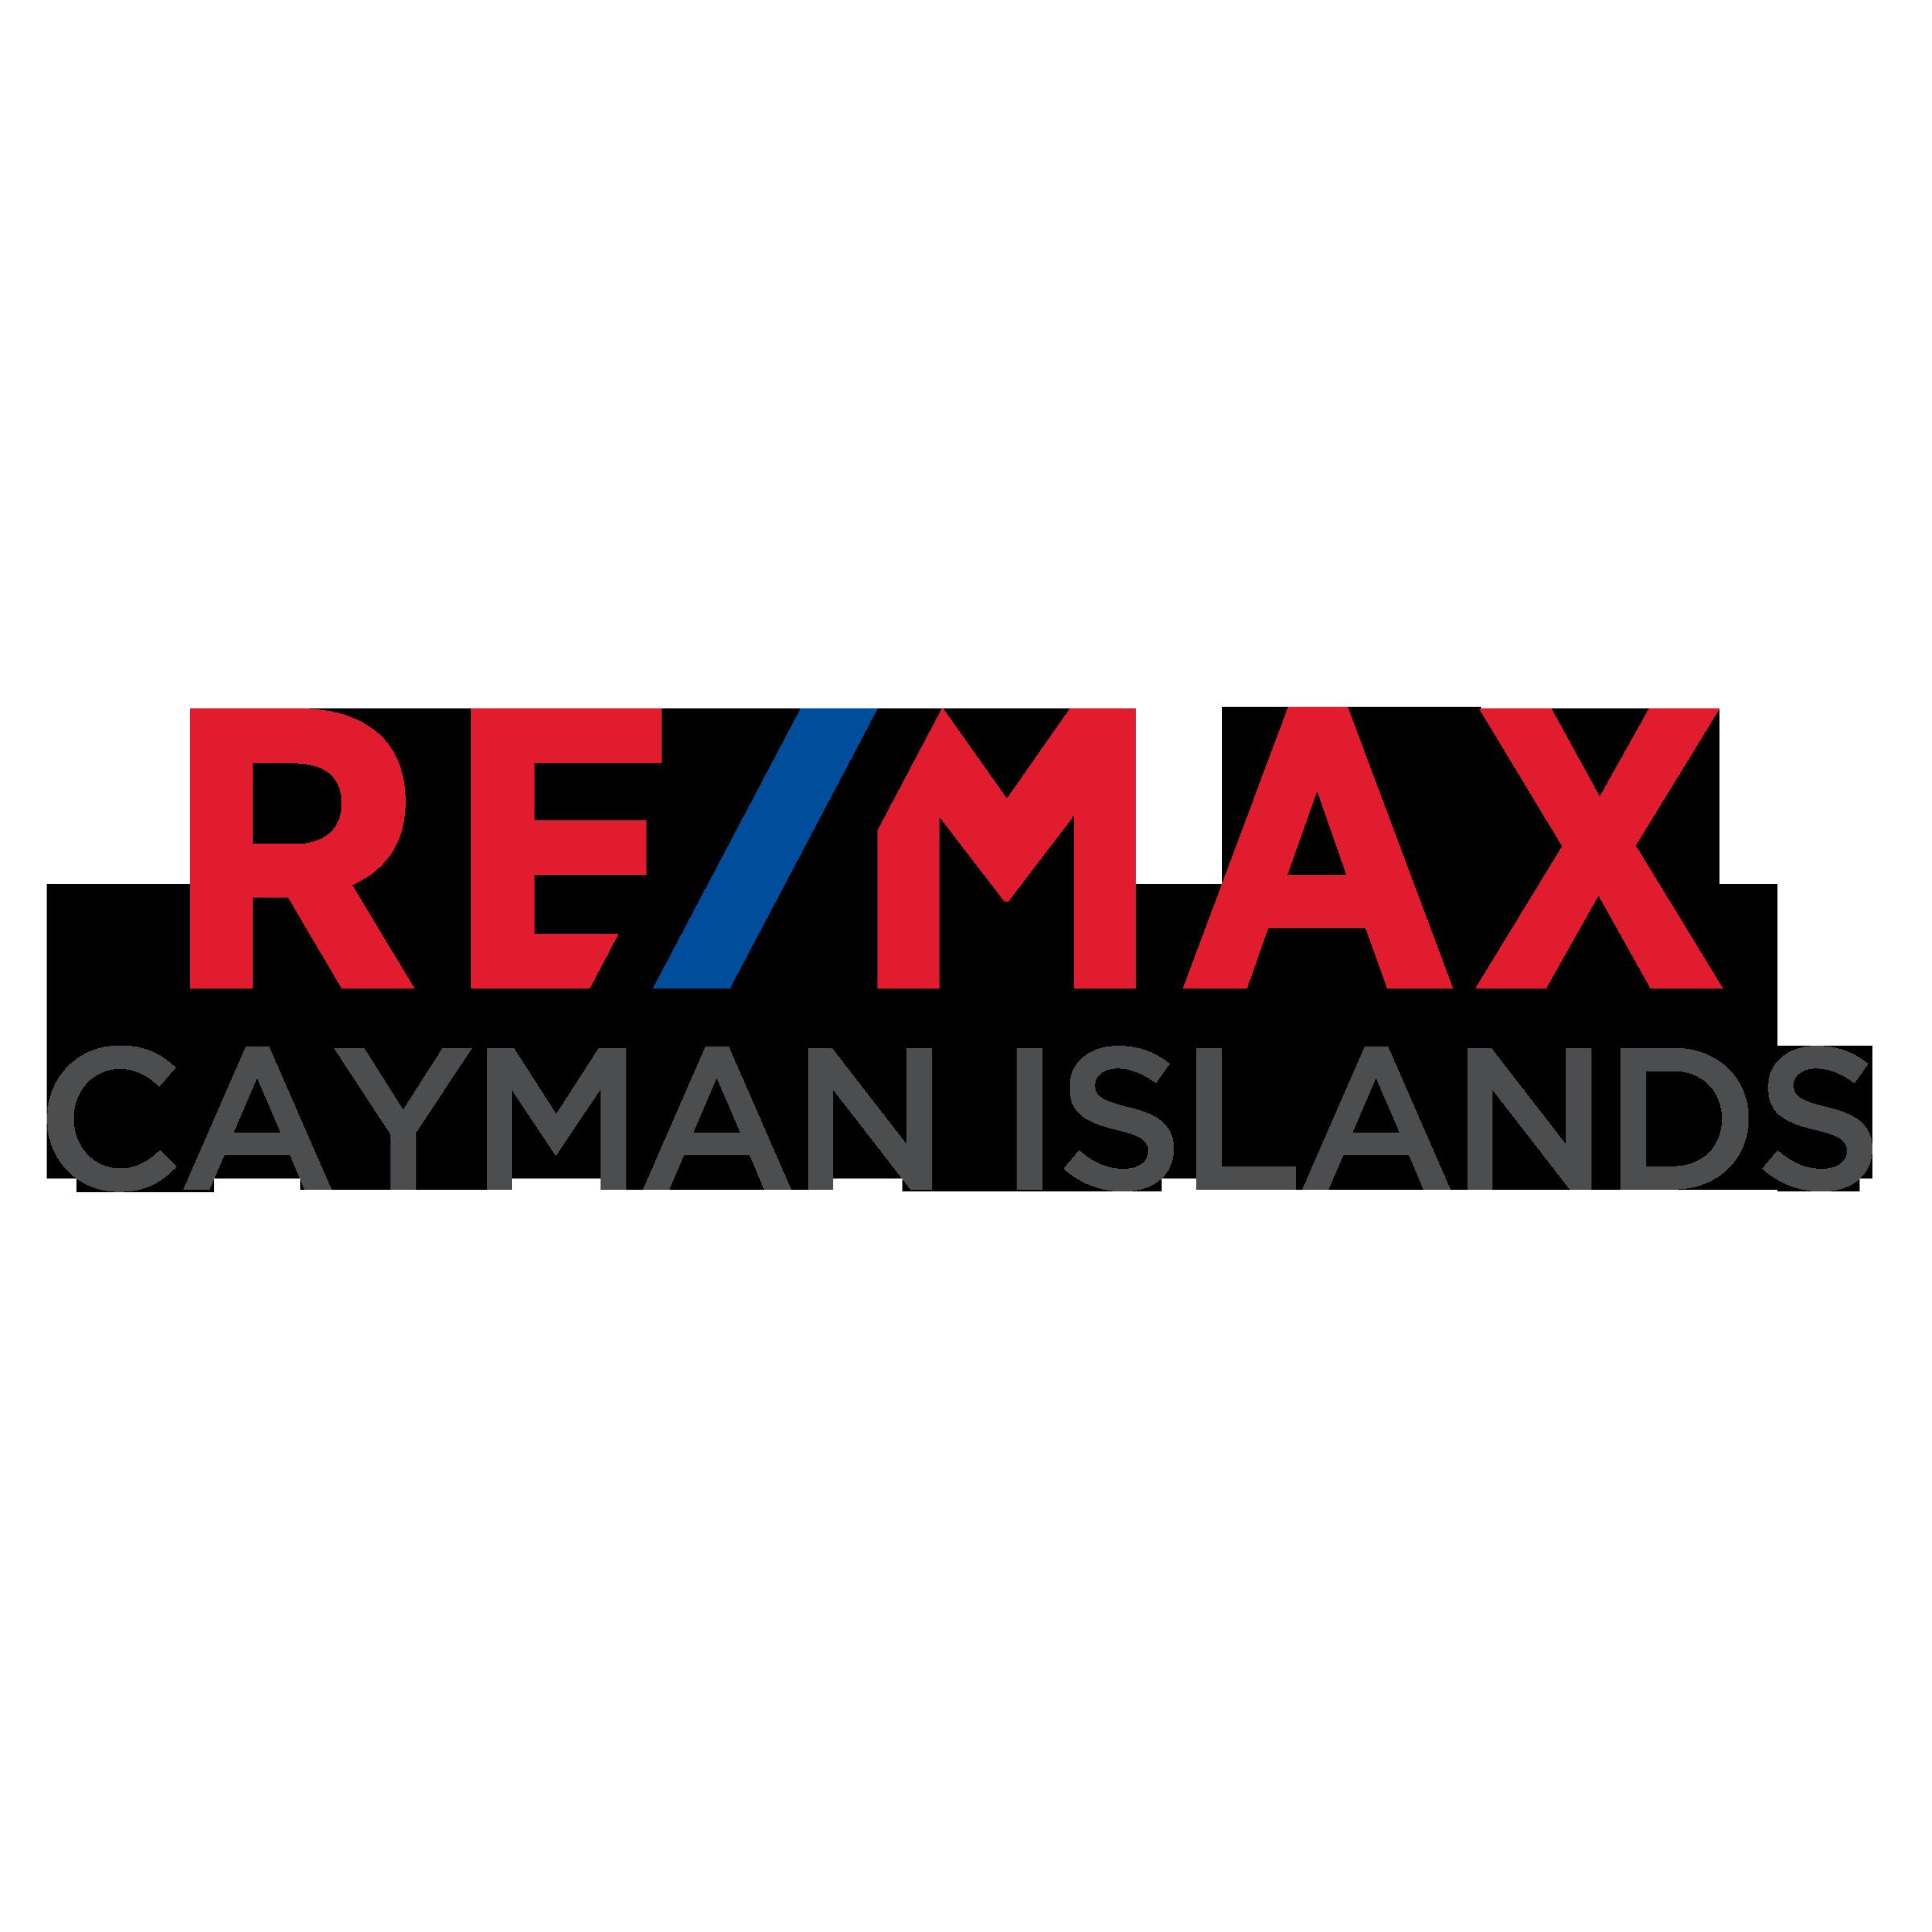 RE/MAX Cayman Islands